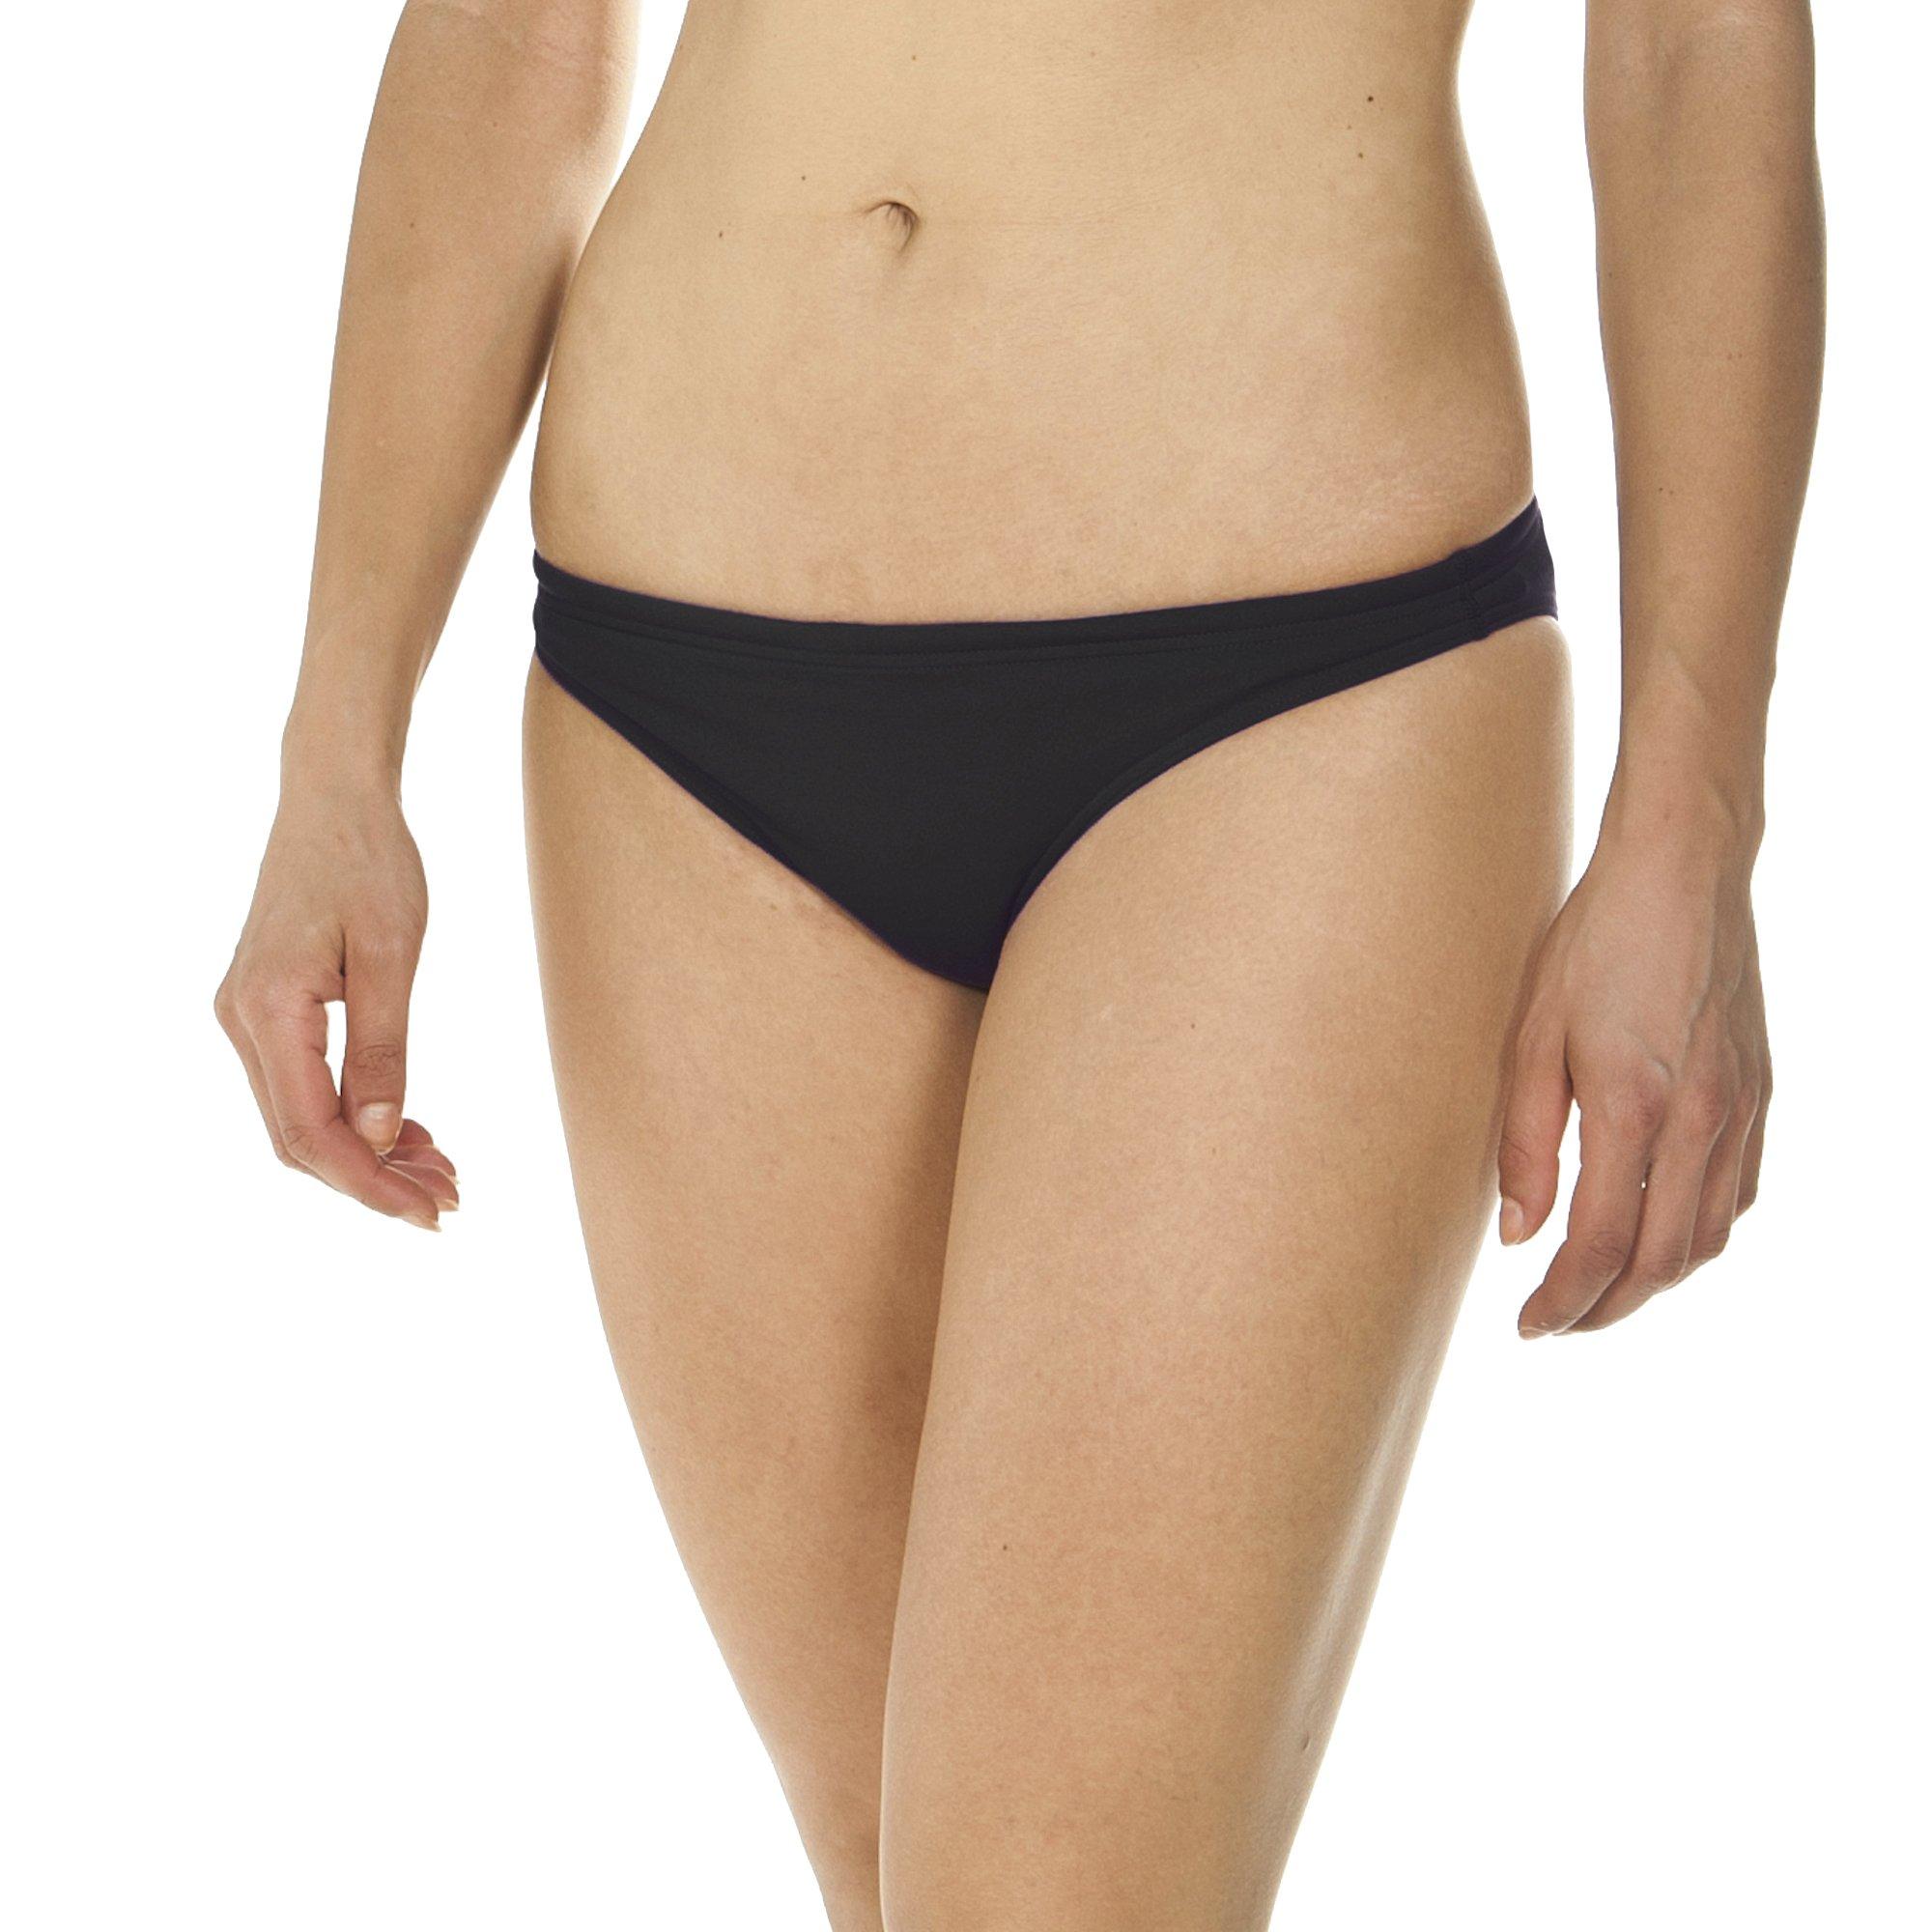 Arena Rulebreaker Real Bikini Bottom, Black-Yellow Star, Small by Arena